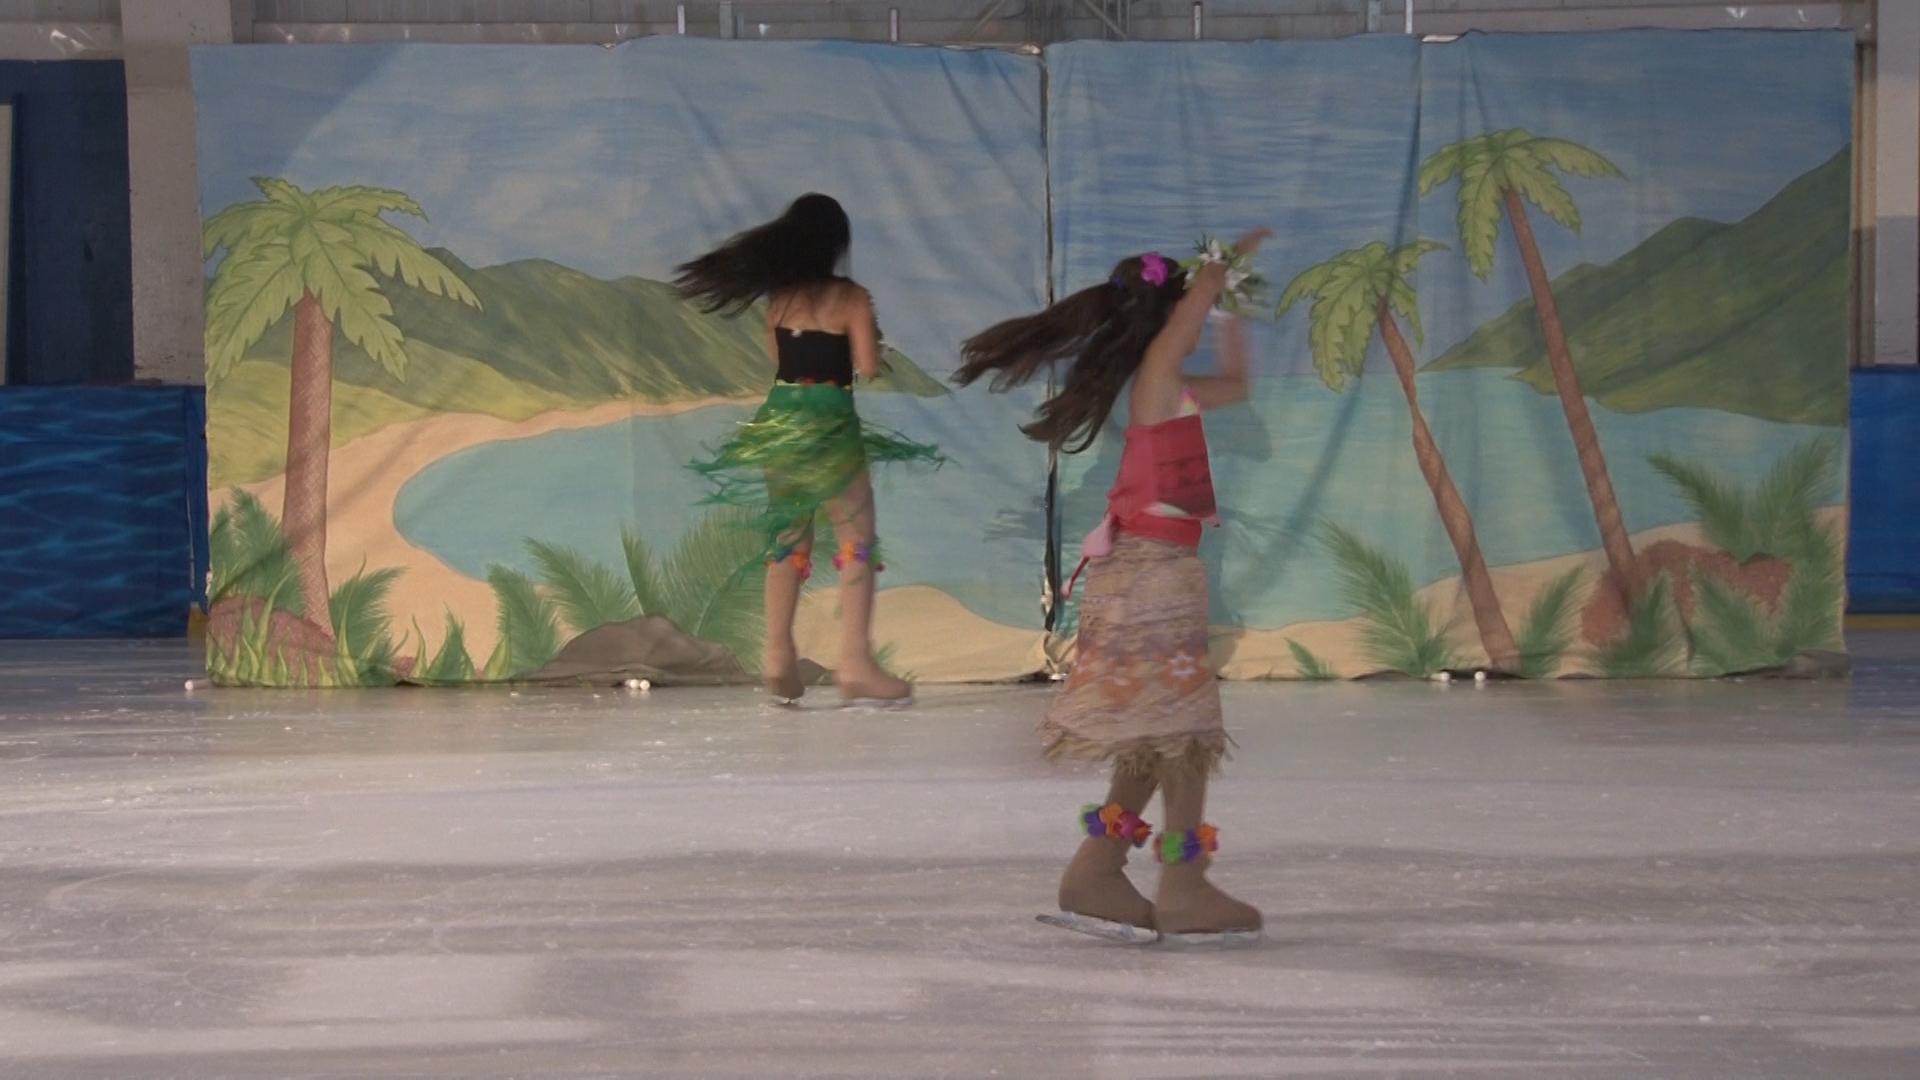 Power Play Maui Skate on Ice 071417.00_08_17_04.Still010.jpg